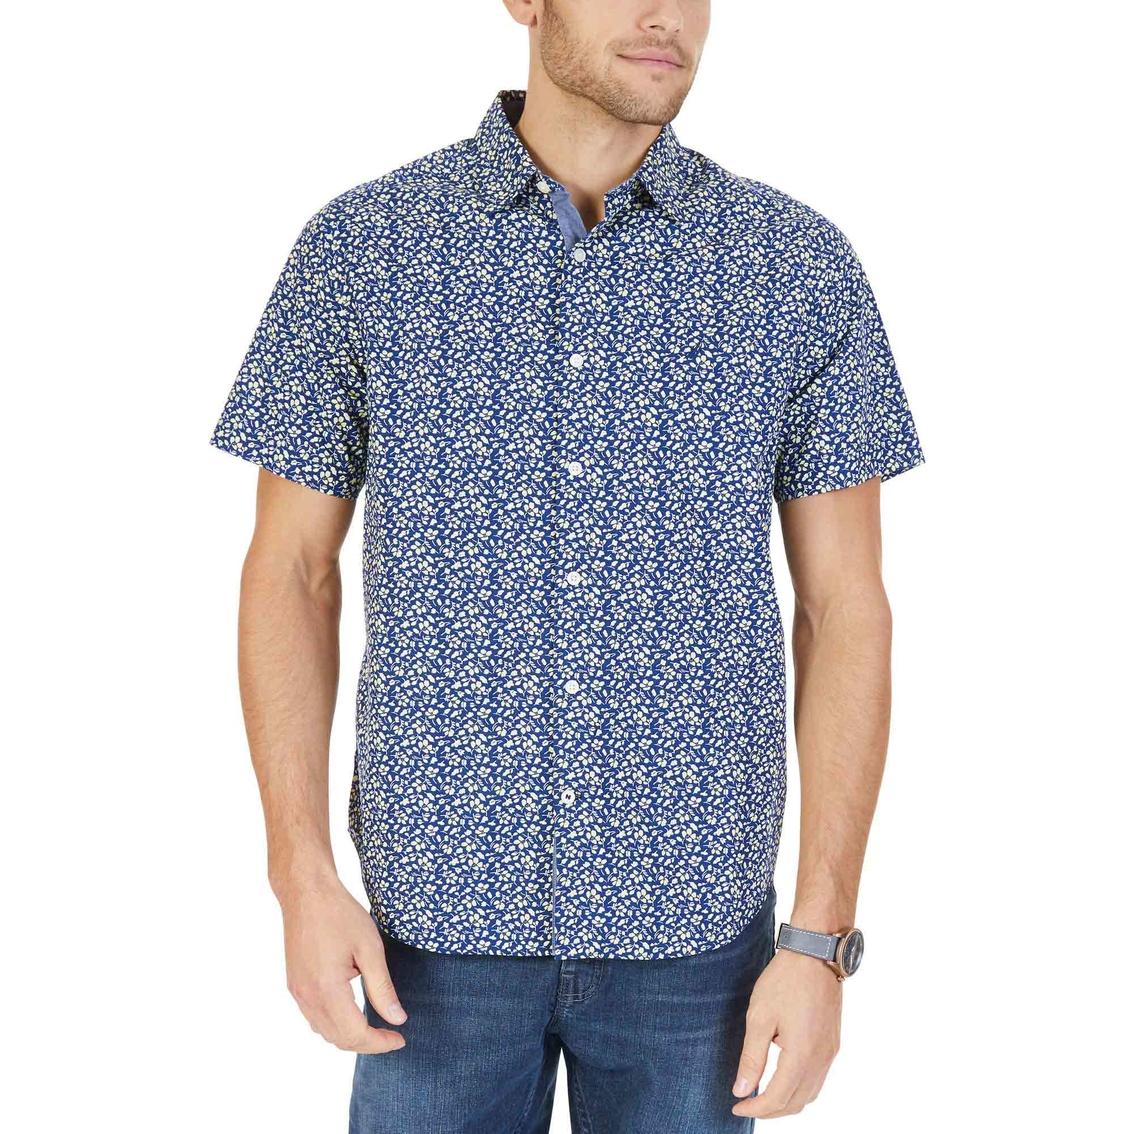 2a5050b2dd670a Nautica Classic Fit Floral Print Shirt   Casual   Apparel   Shop The ...